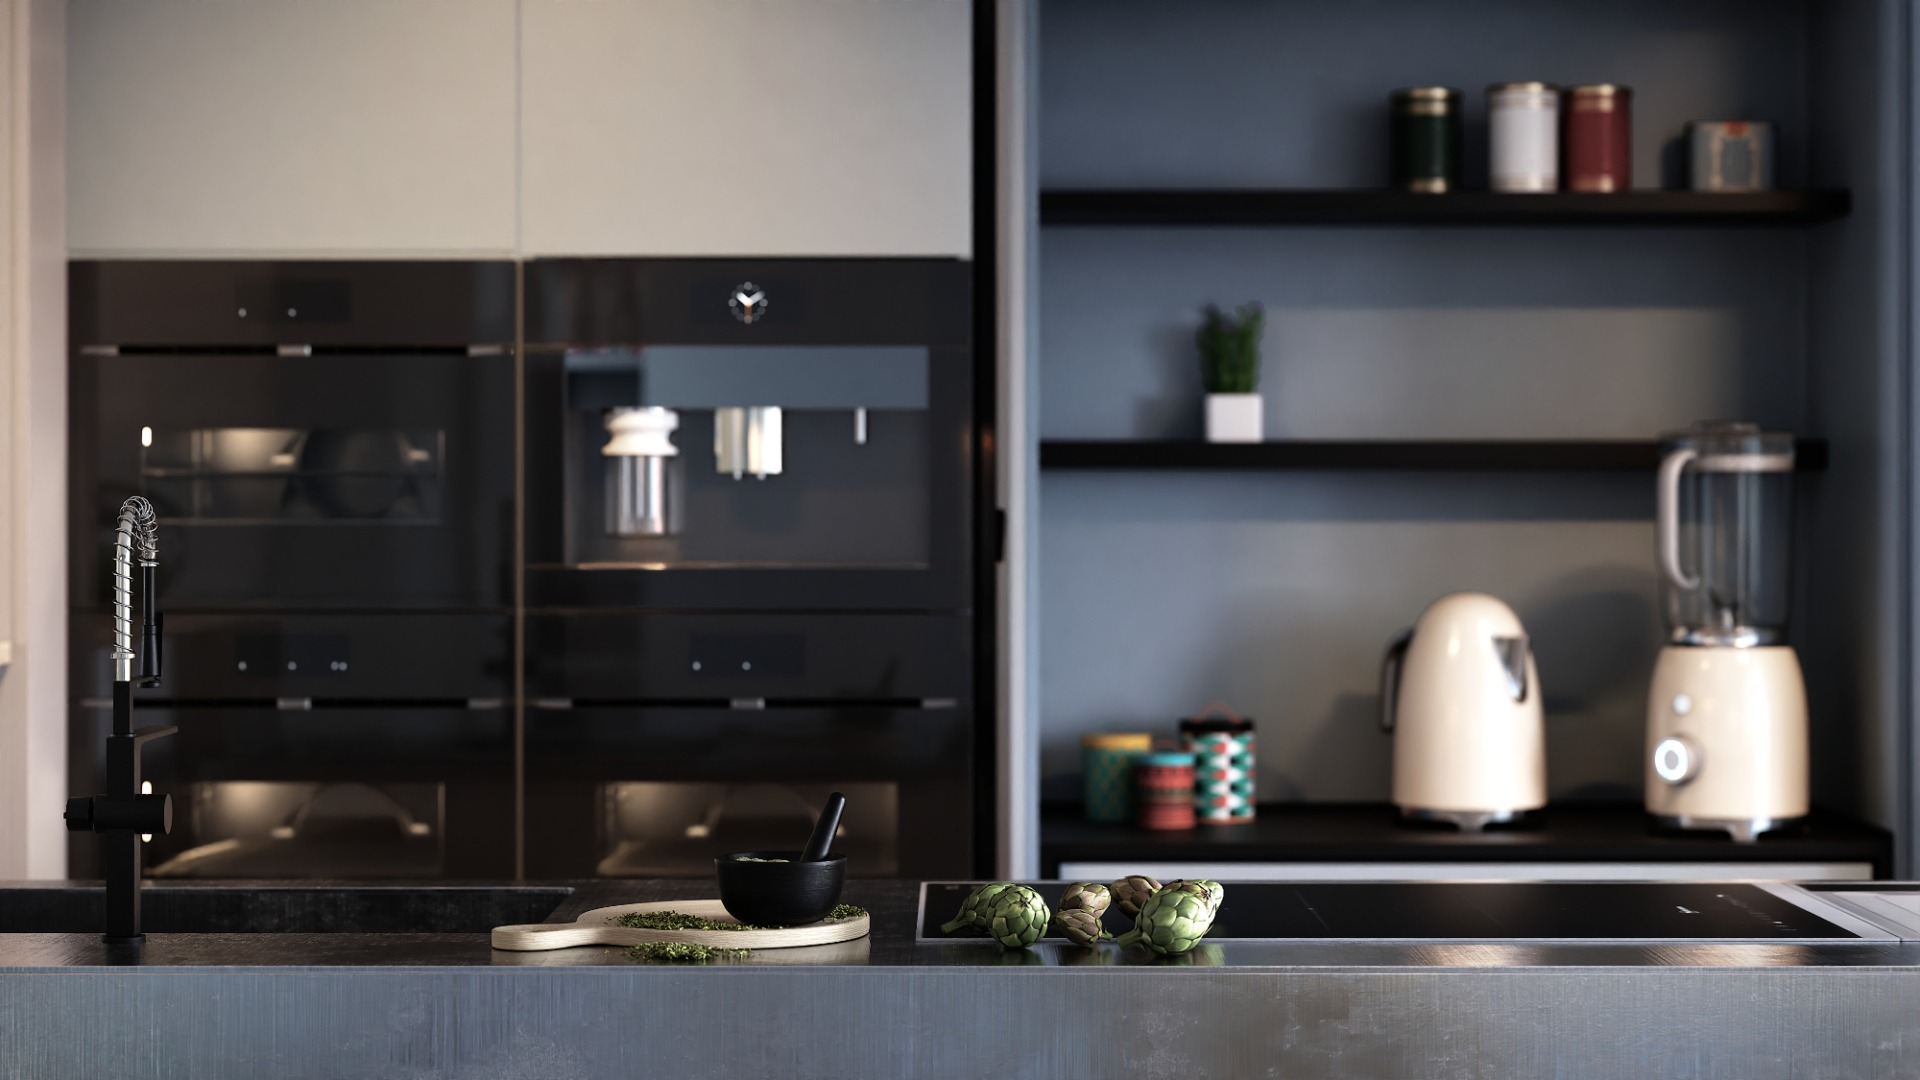 04-cam_kitchen-details-food